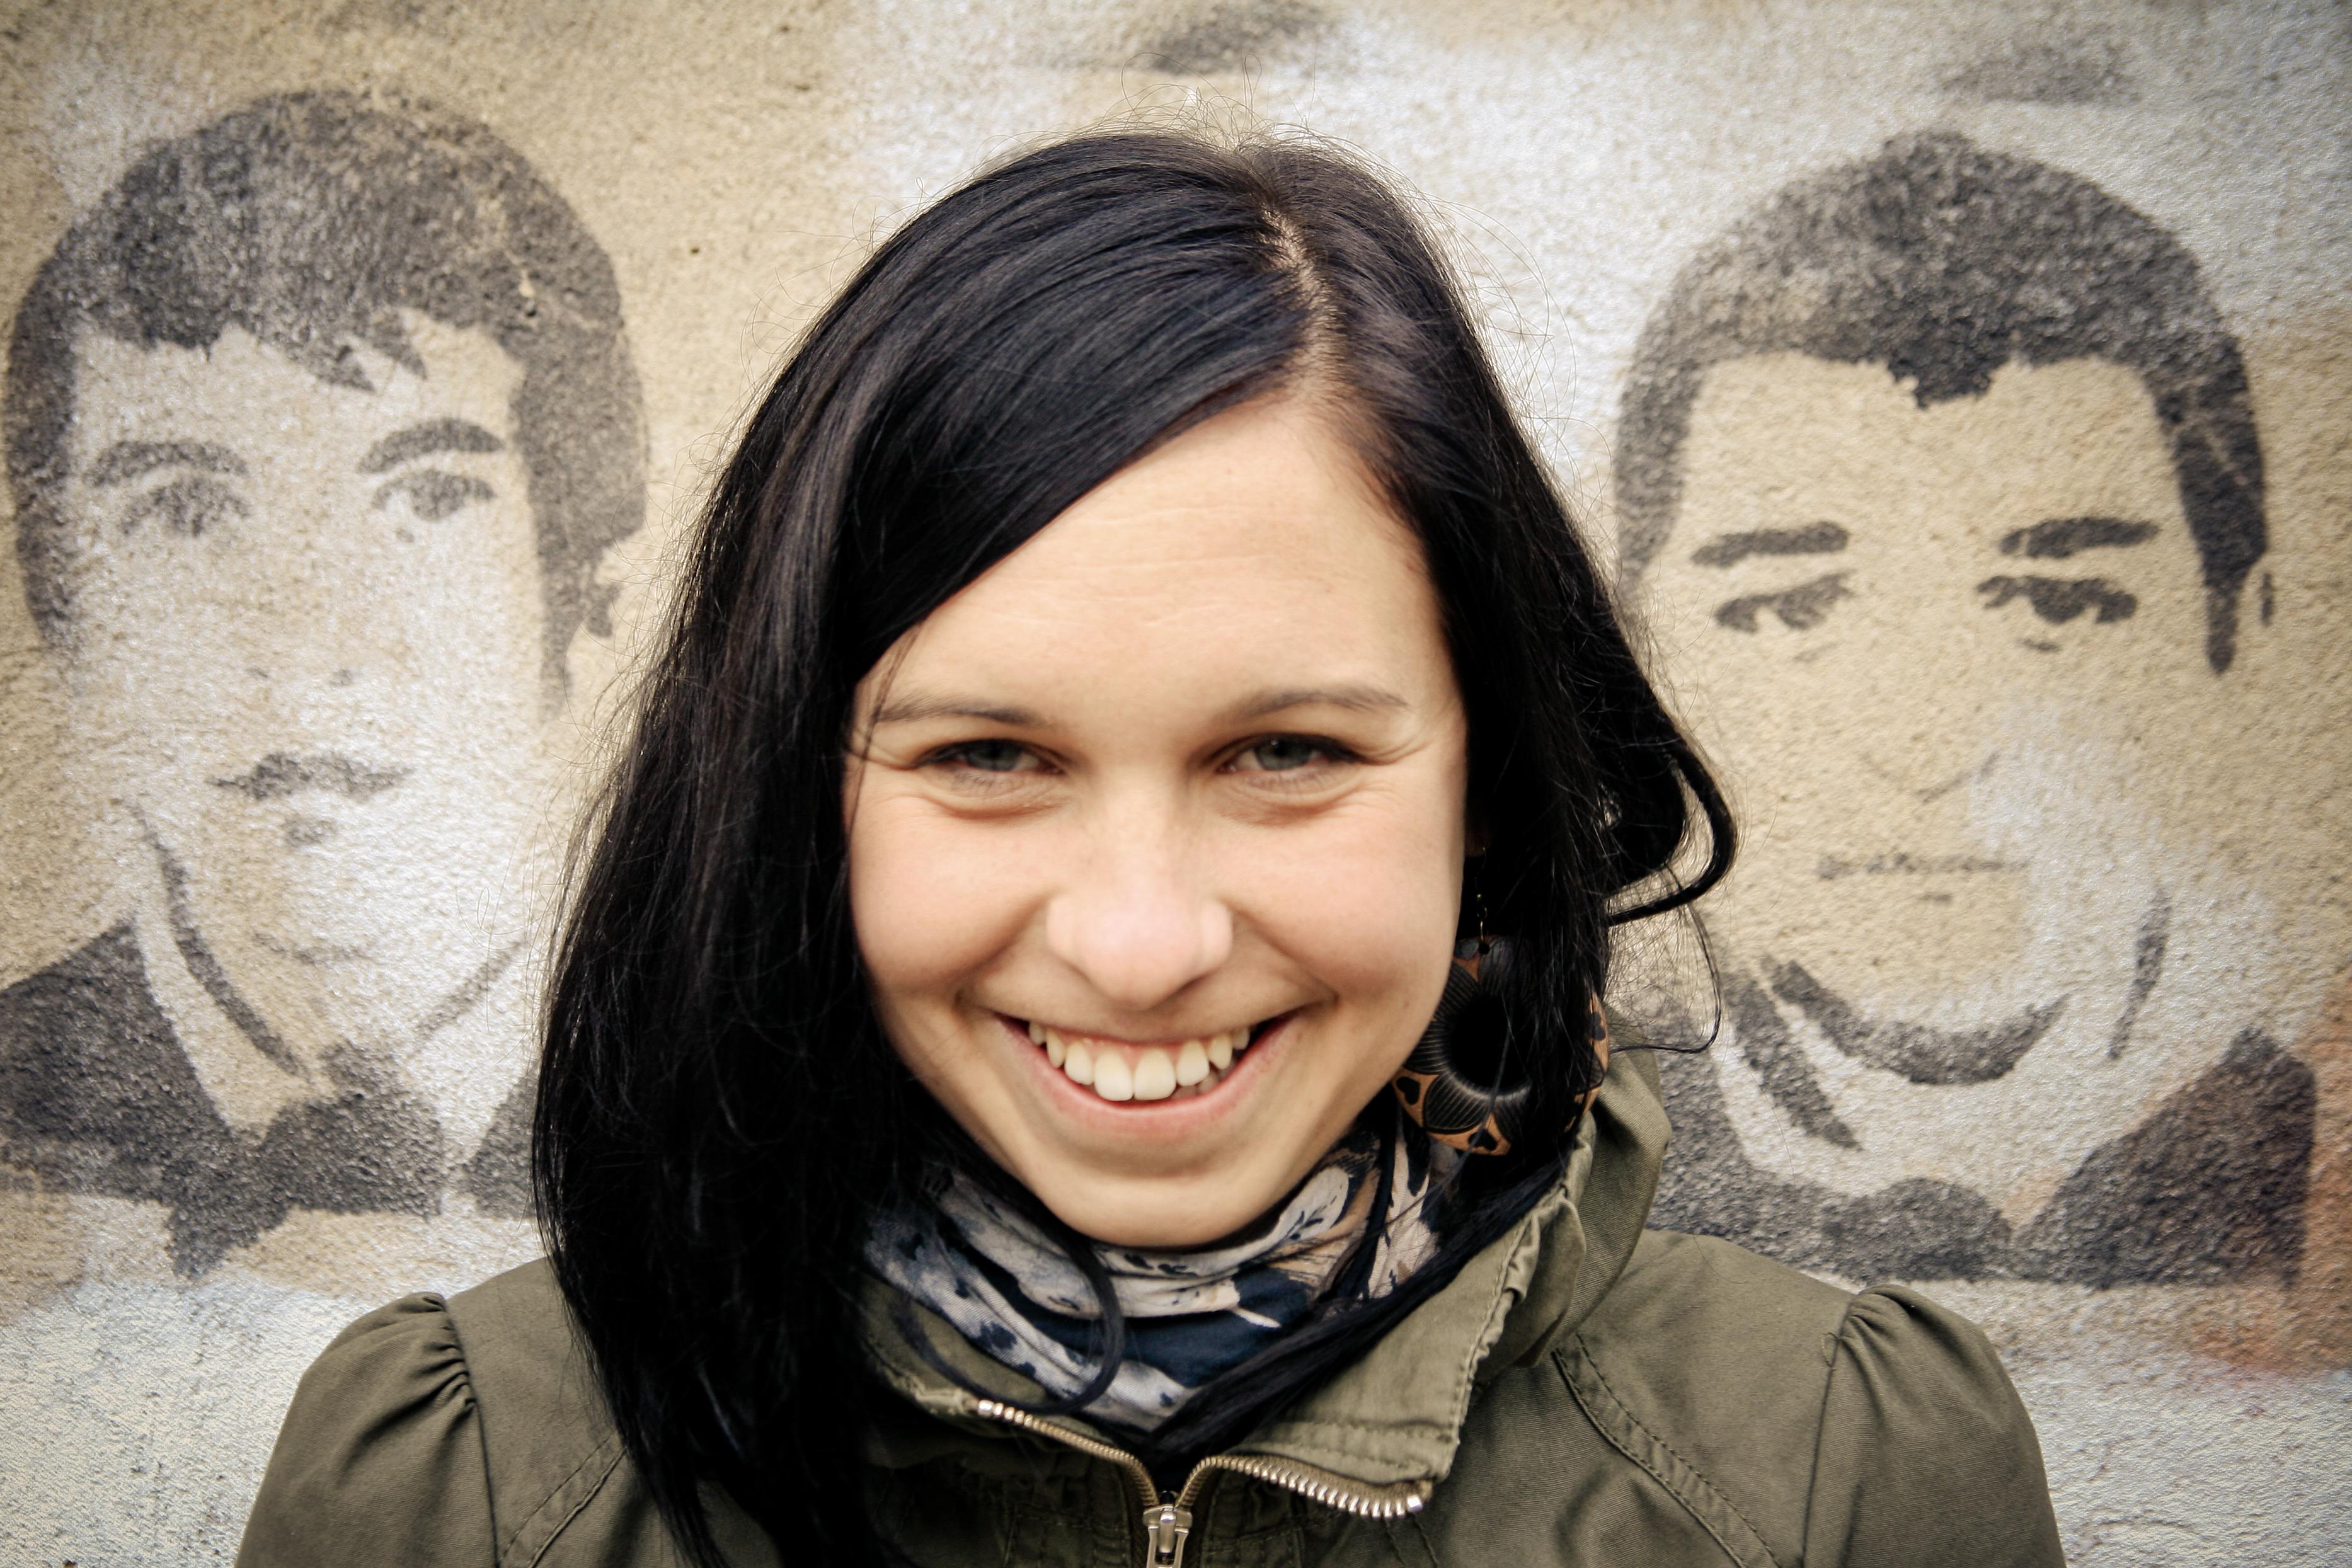 Polish EVS Volunteer 2011